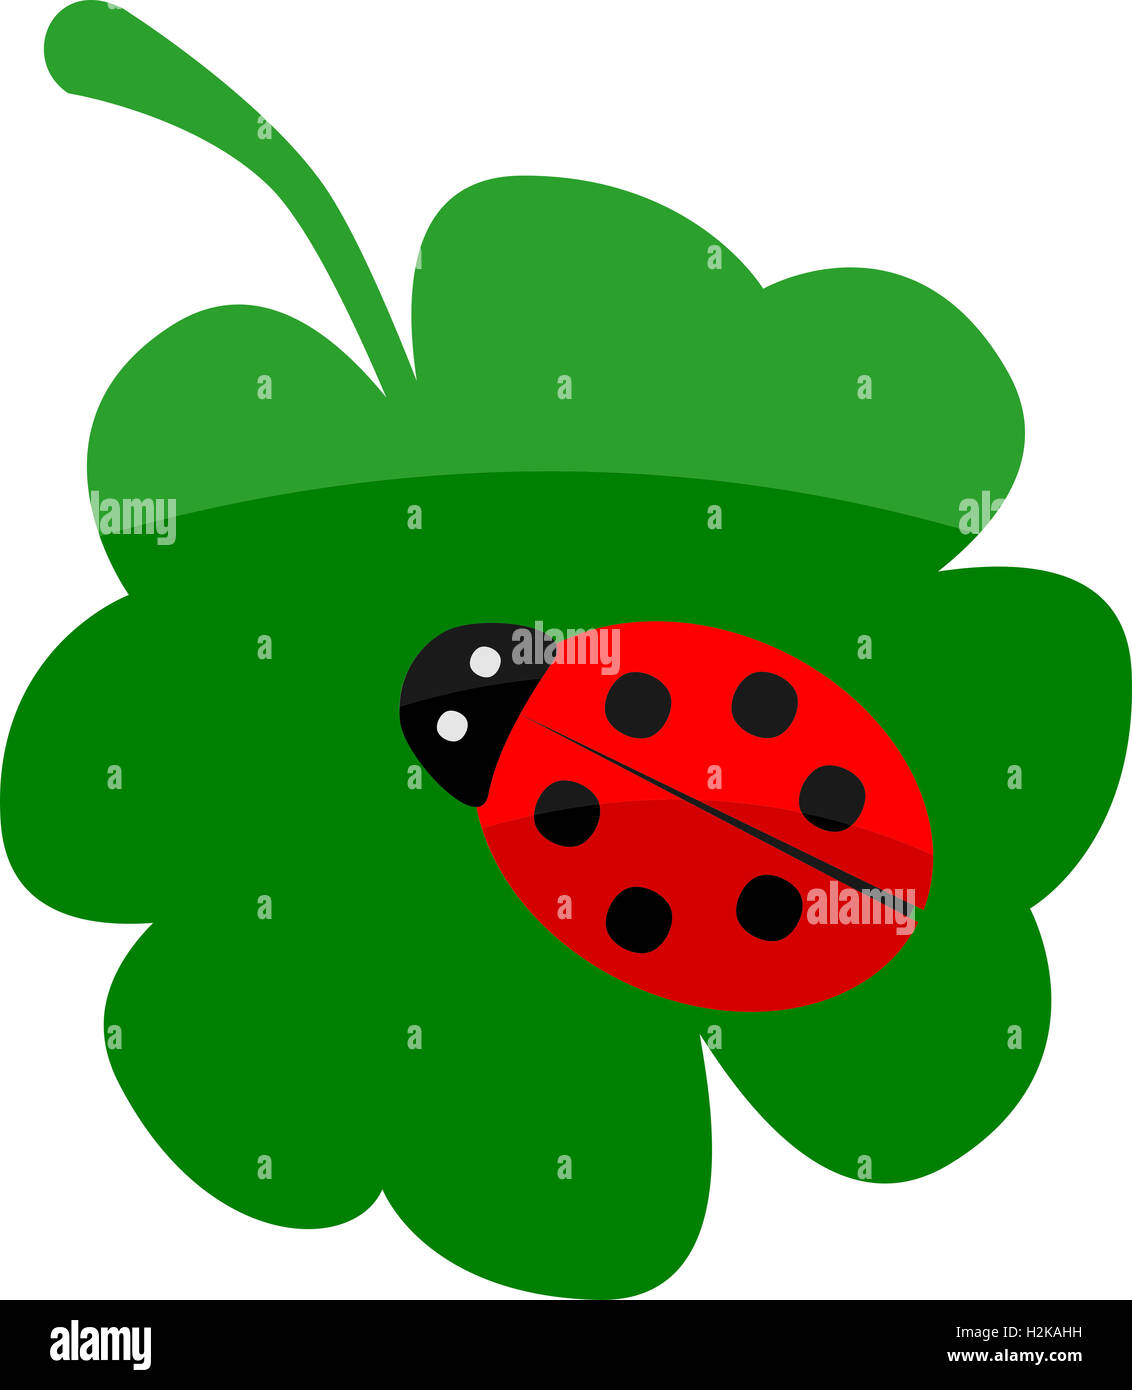 Ladybug Clover Stock Photos & Ladybug Clover Stock Images - Page 2 ...